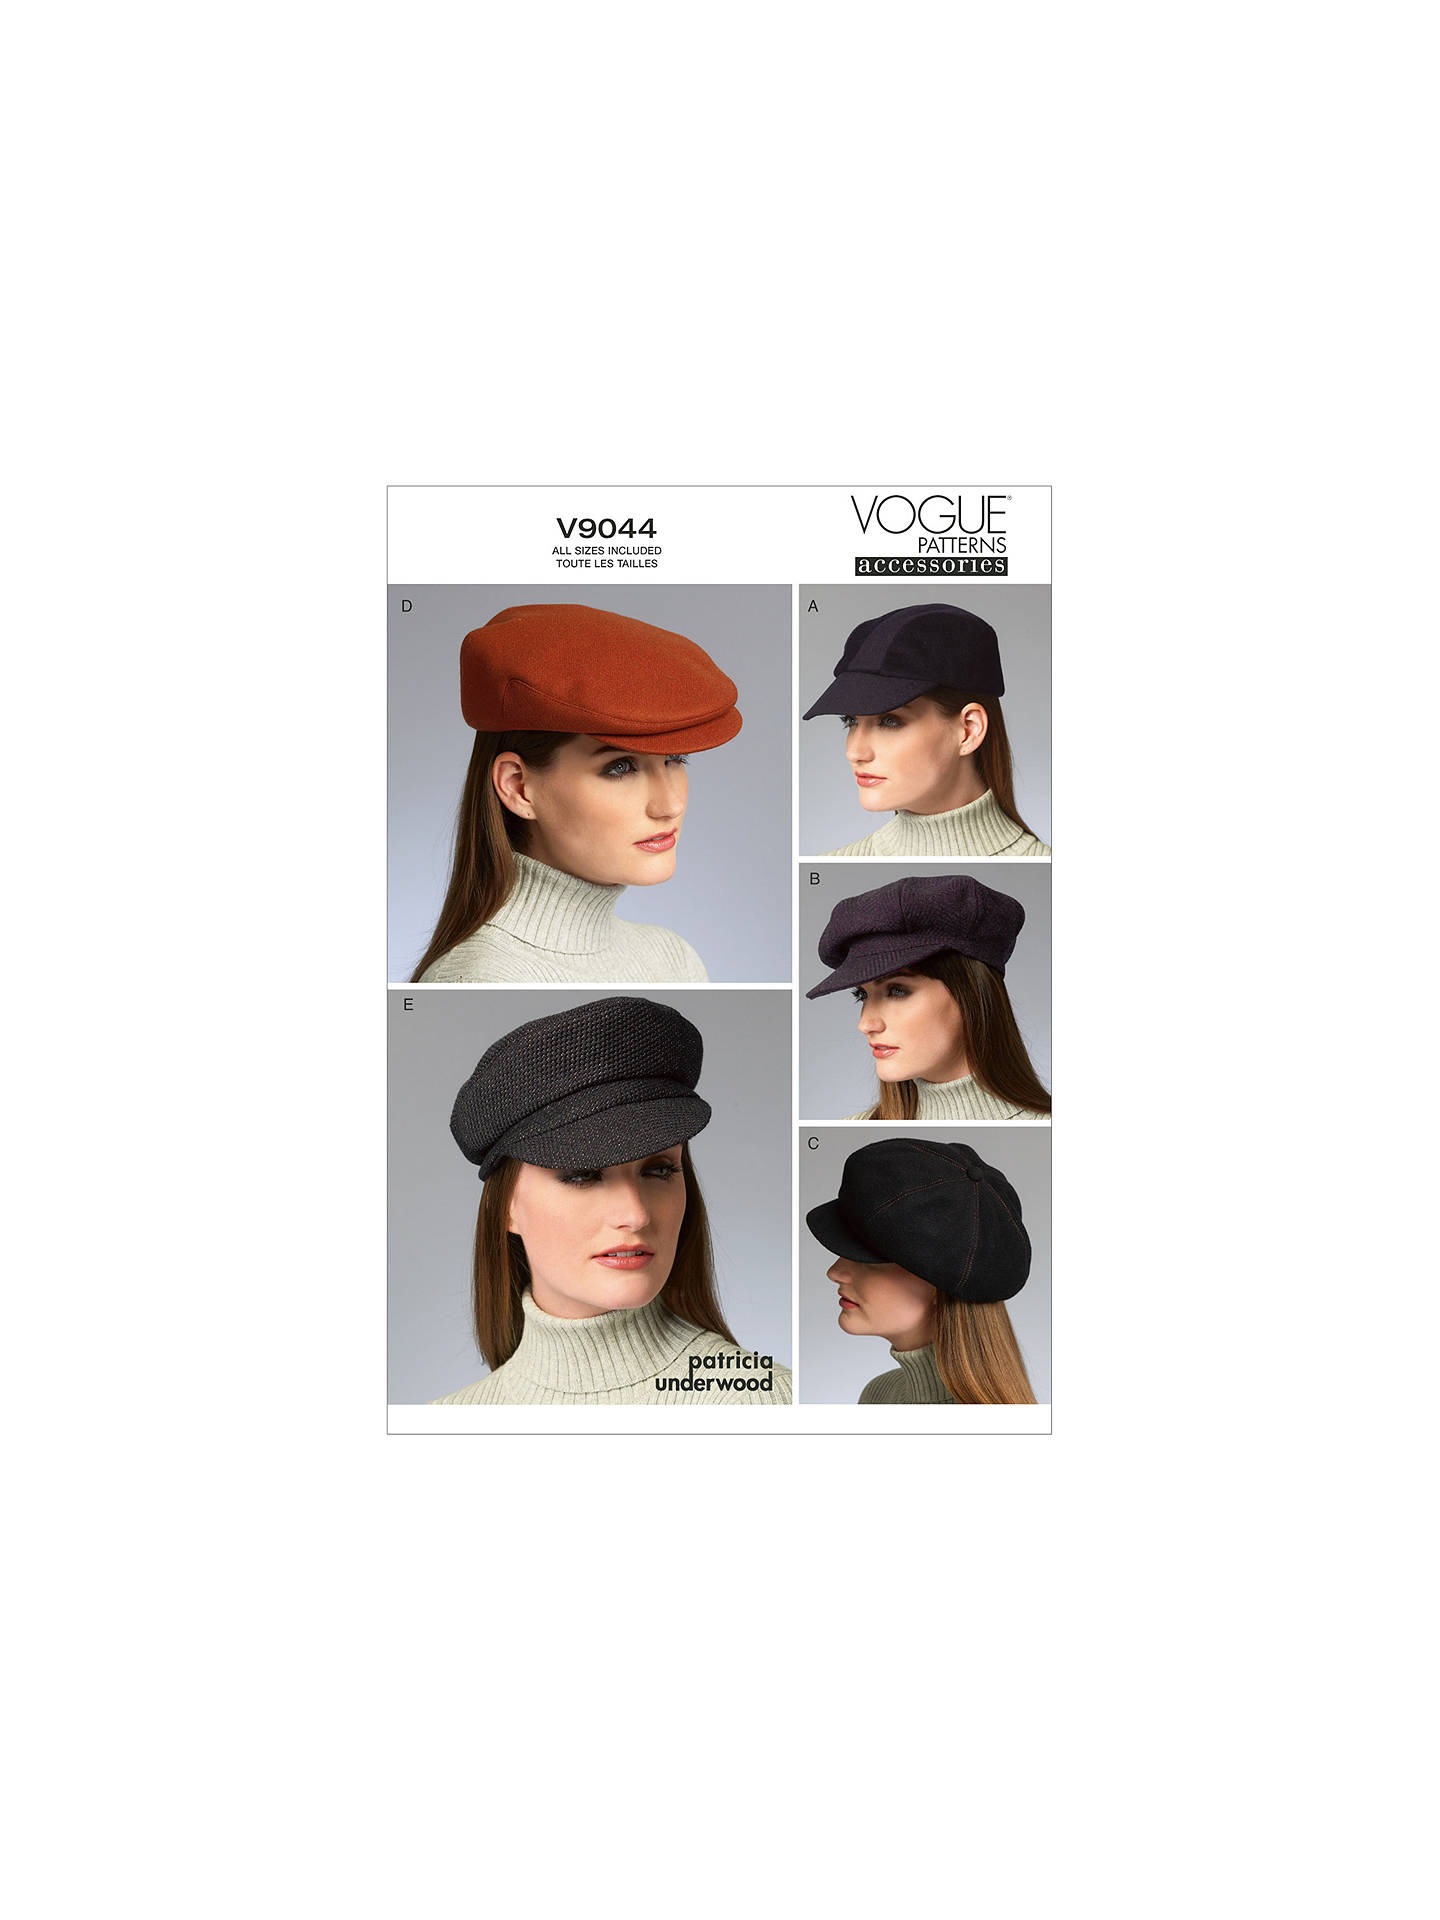 BuyVogue Patrcia Underwood Women s Hat Sewing Pattern bdfc4106566